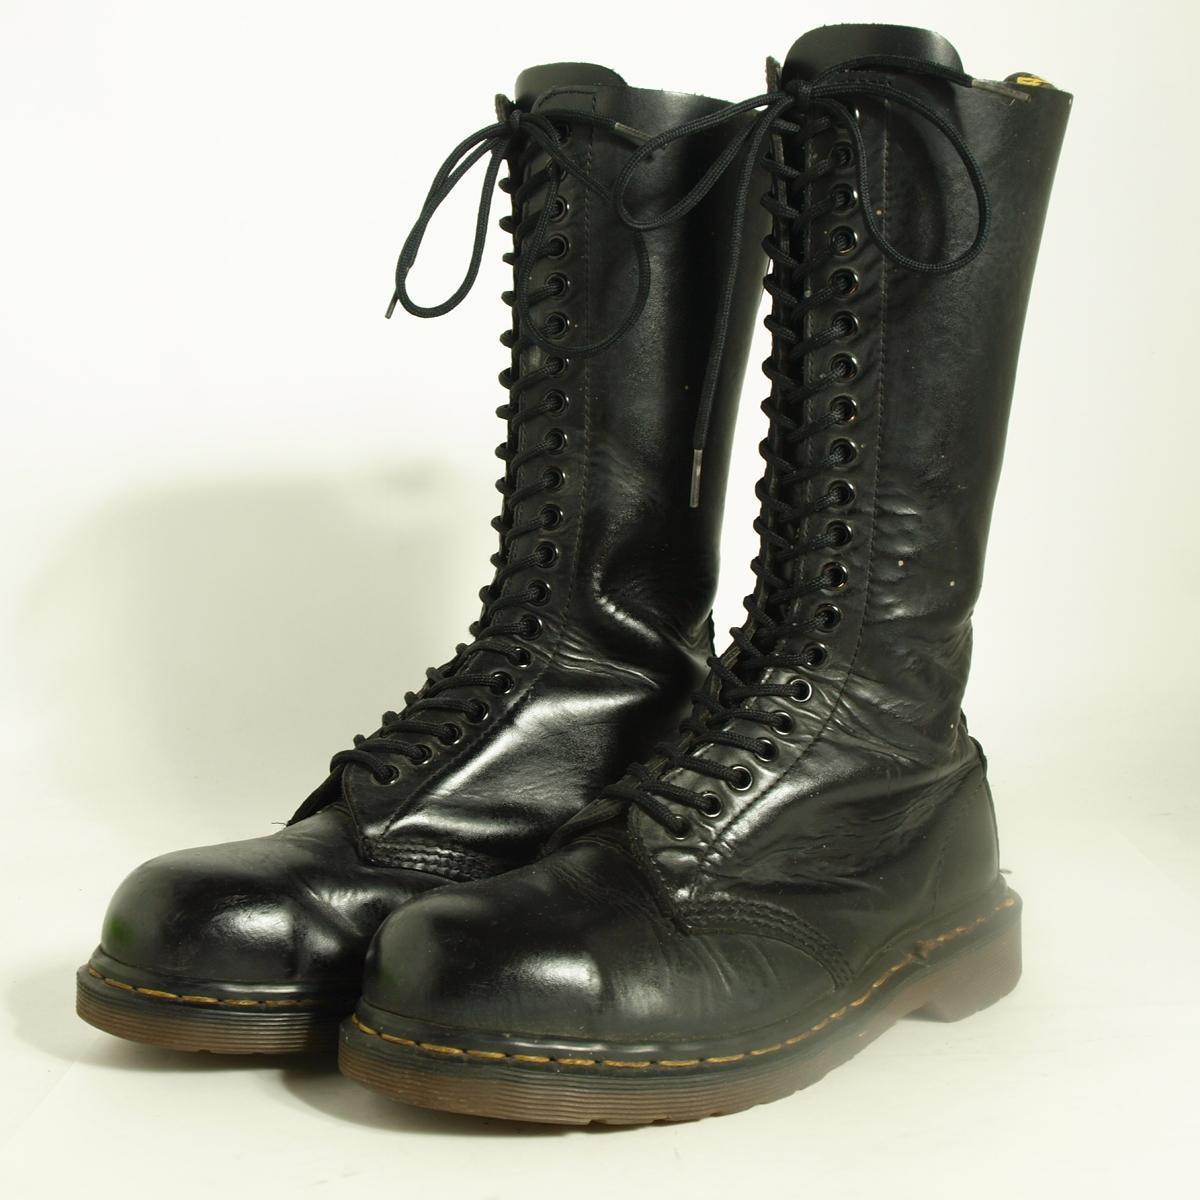 VINTAGE CLOTHING JAM TRADING   Rakuten Global Market: Steel toe ...